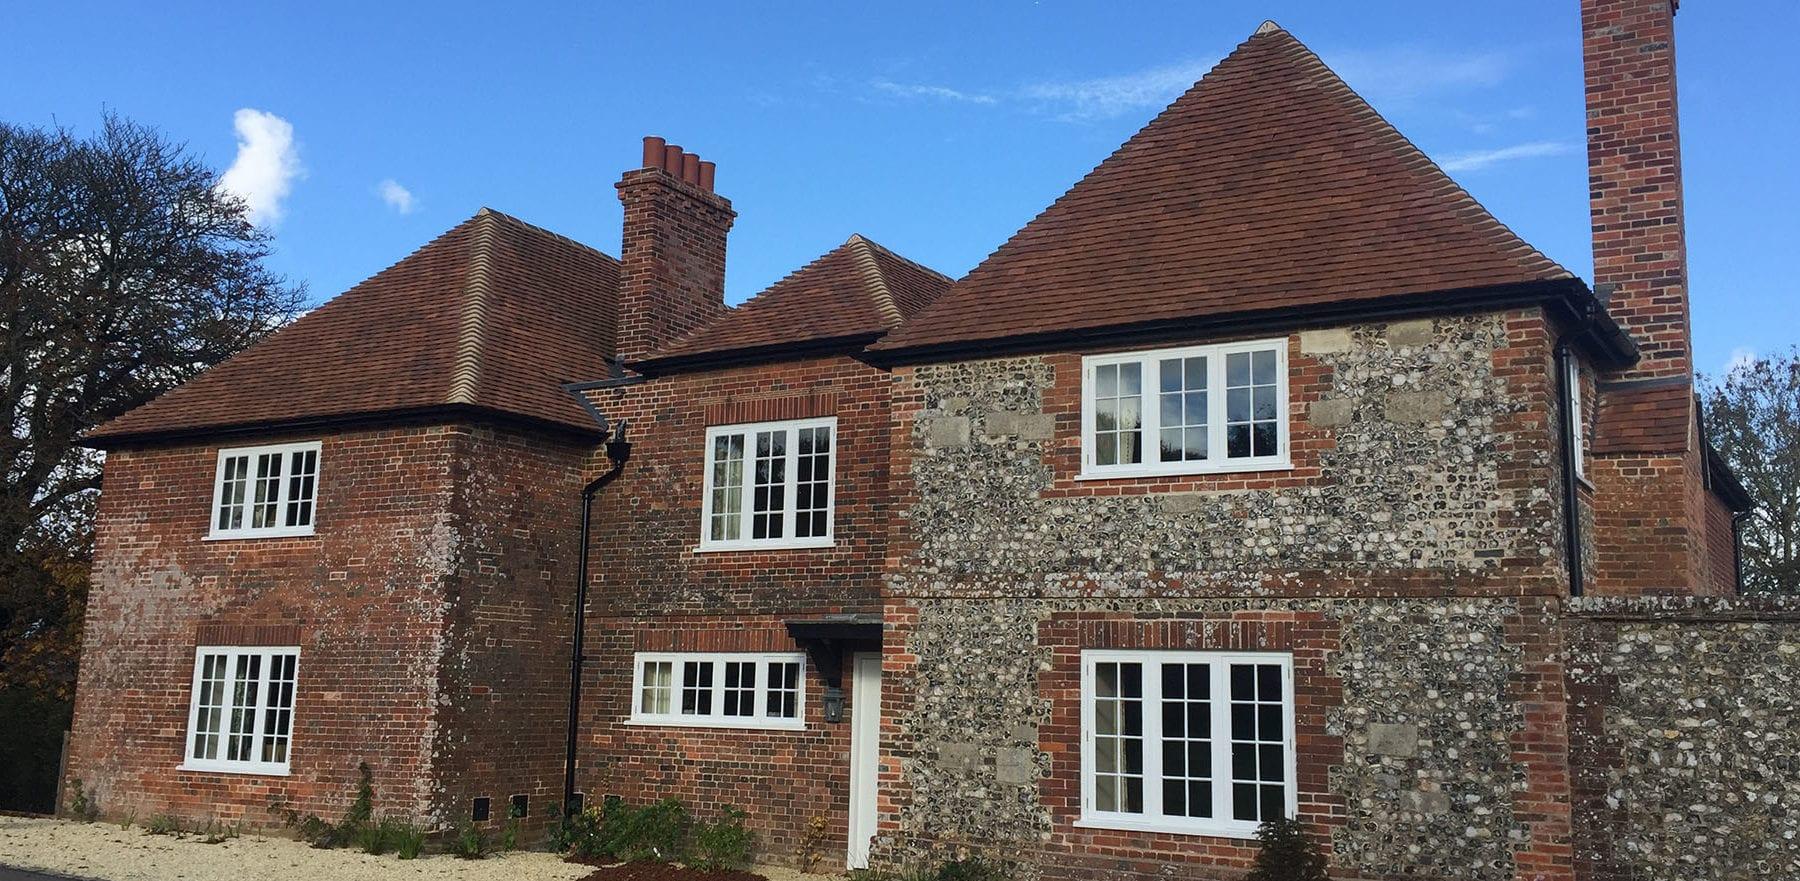 Lifestiles - Handmade Heather Clay Roof Tiles - Barlow, England 3